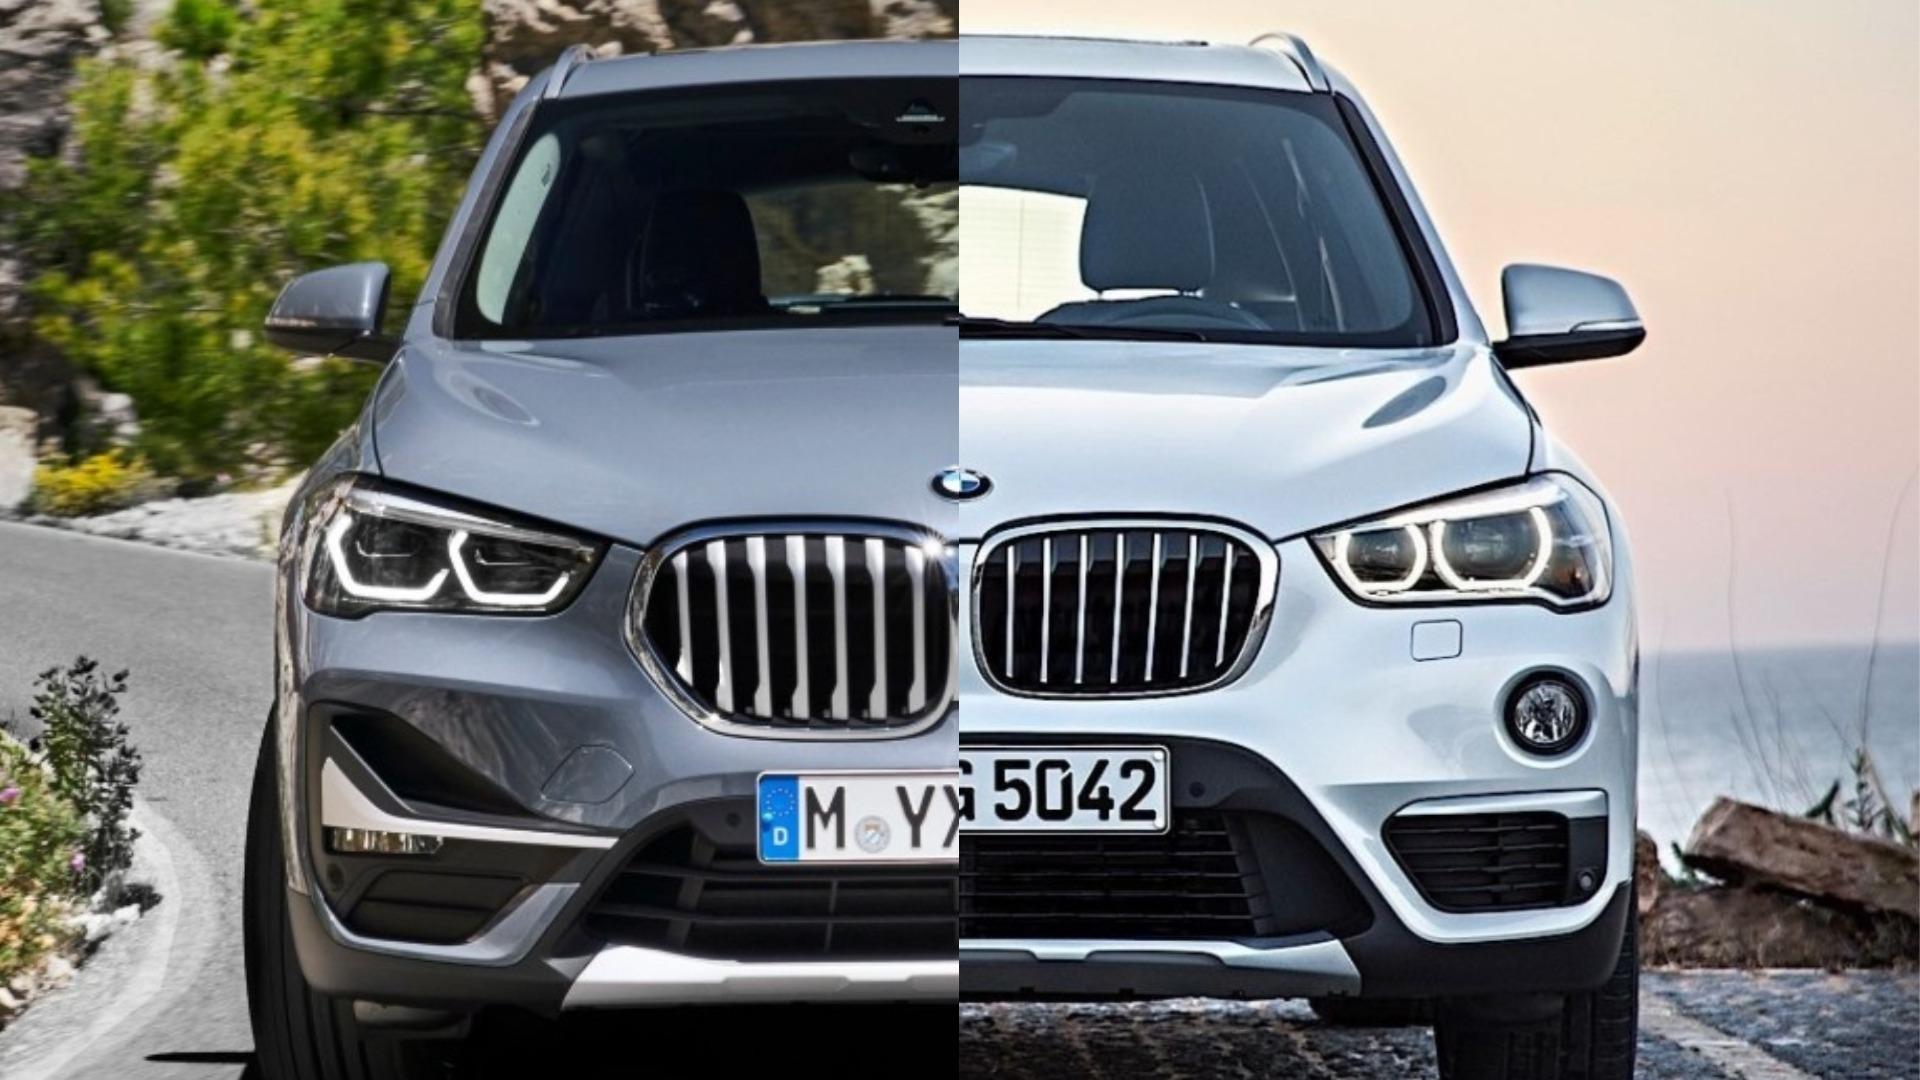 Photo Comparison 2020 Bmw X1 Vs 2016 Bmw X1 Autoevolution